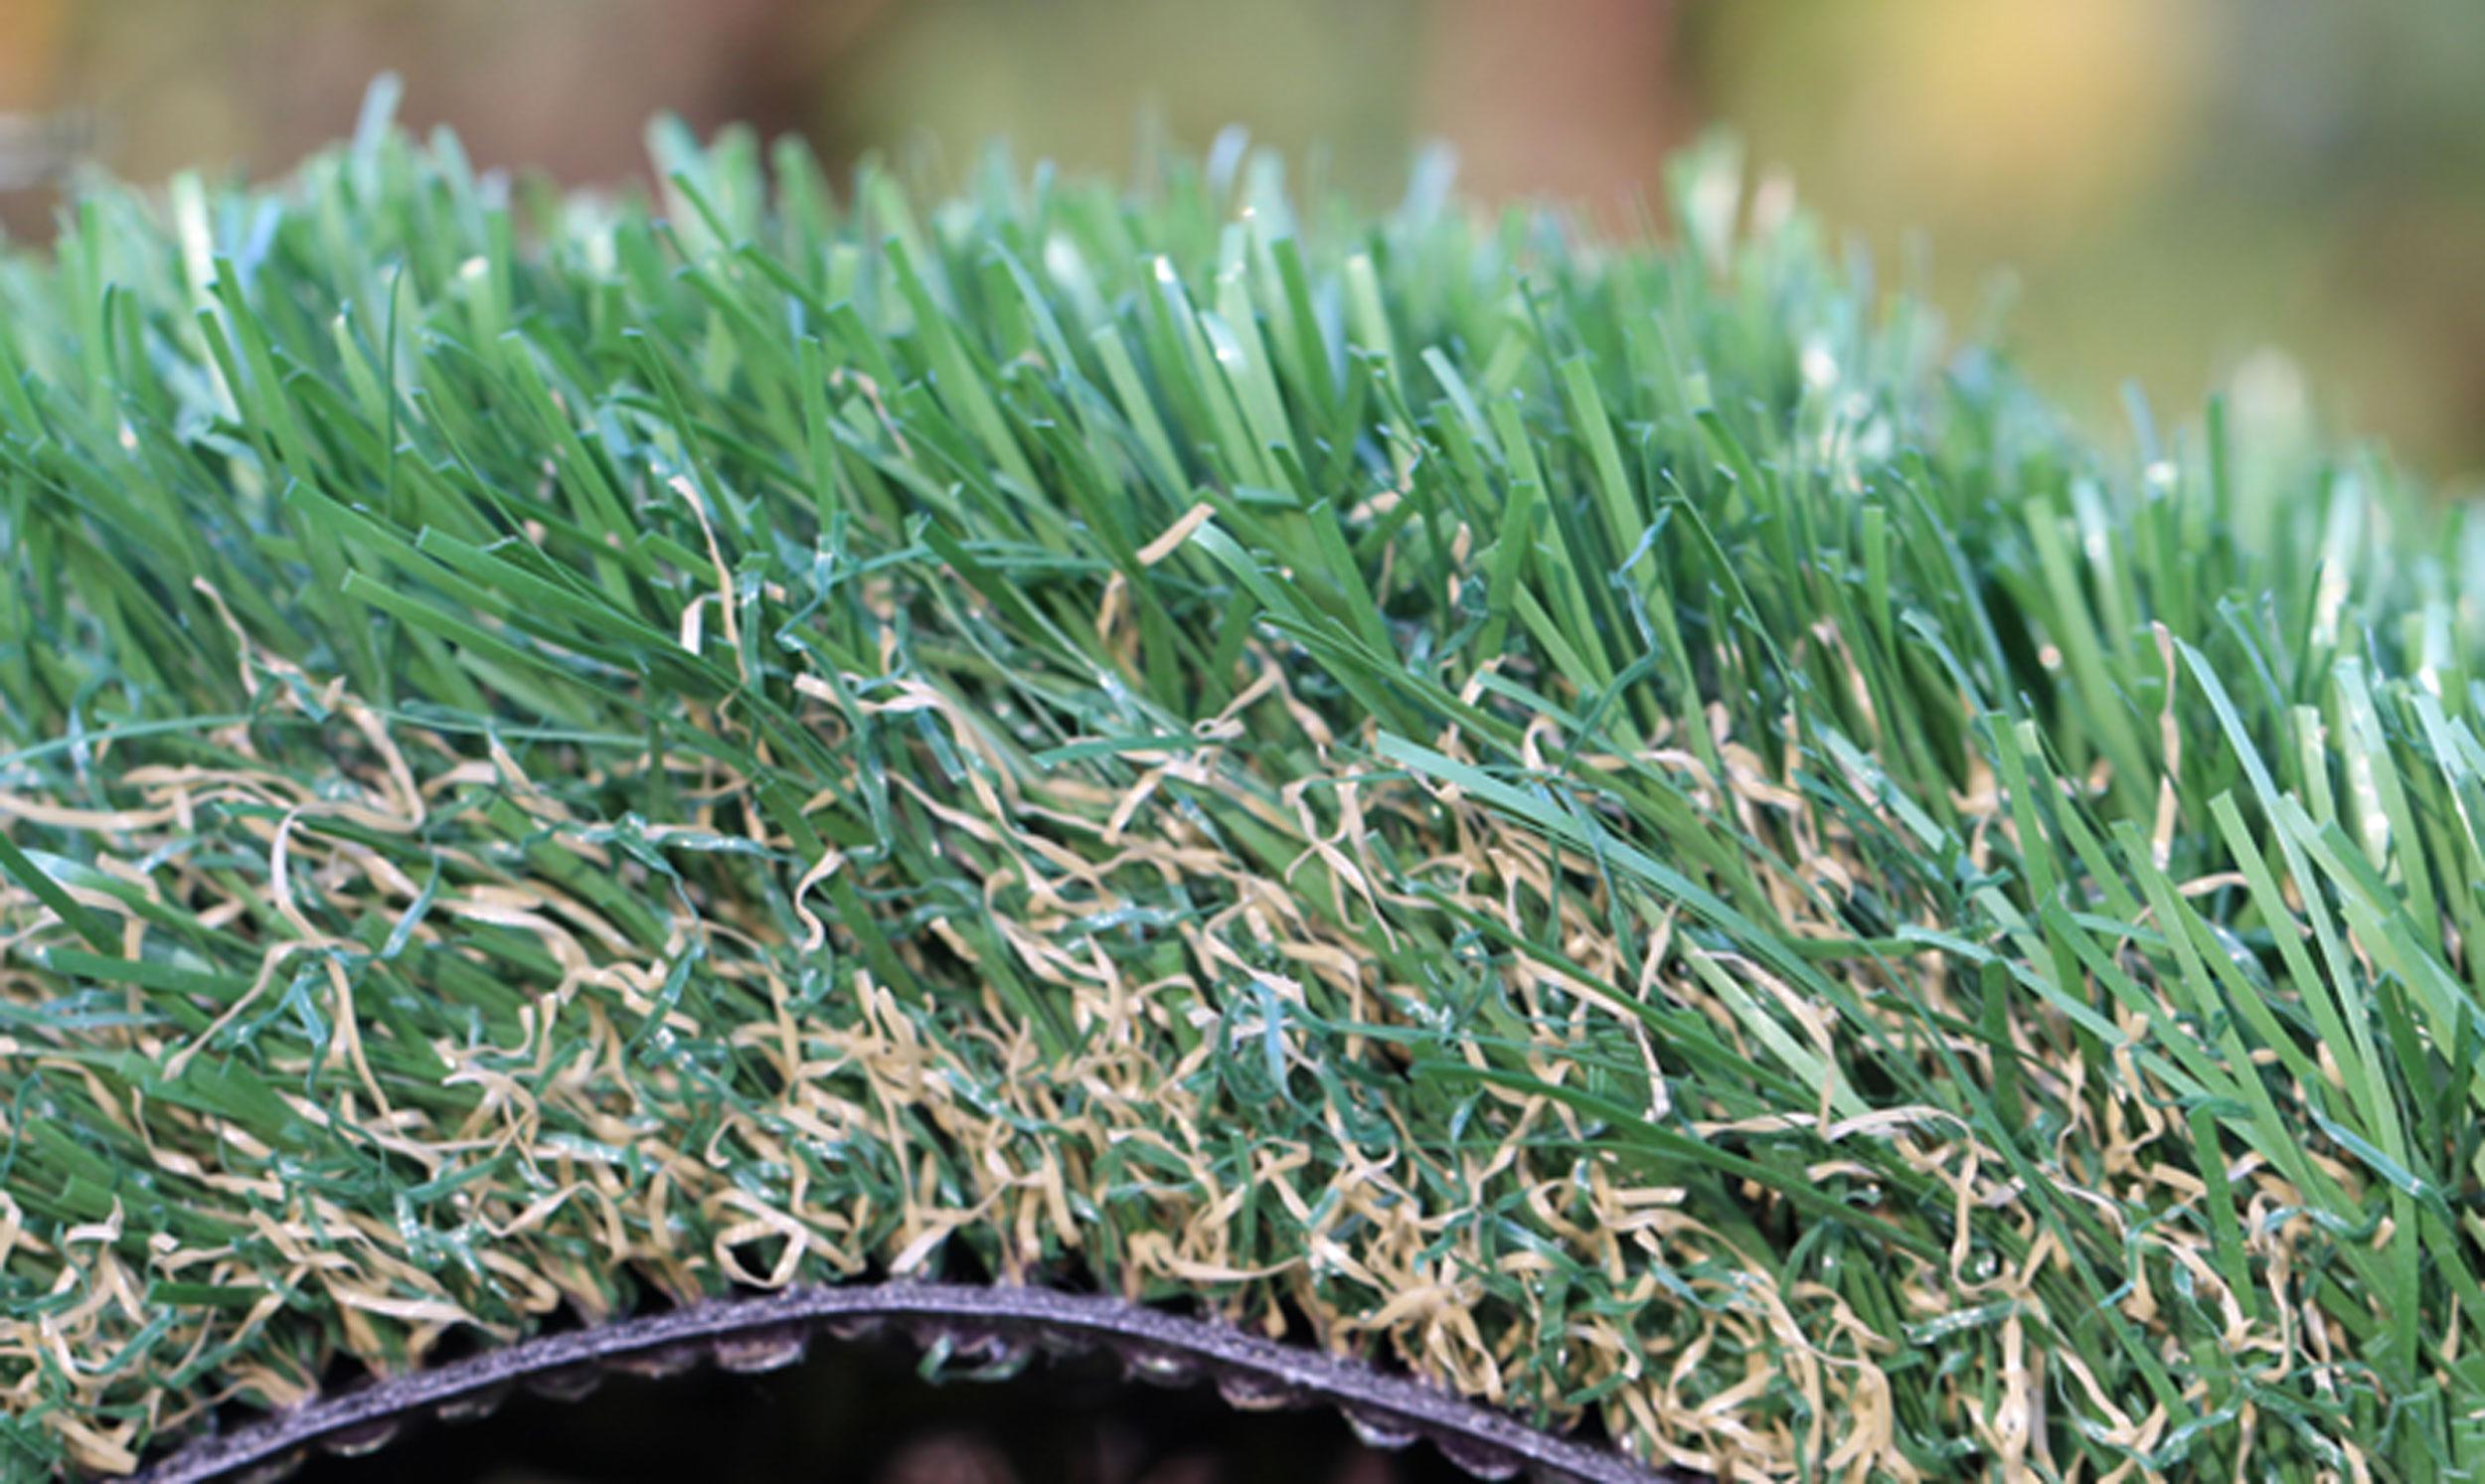 Emerald-80 High Quality Artificial Turf